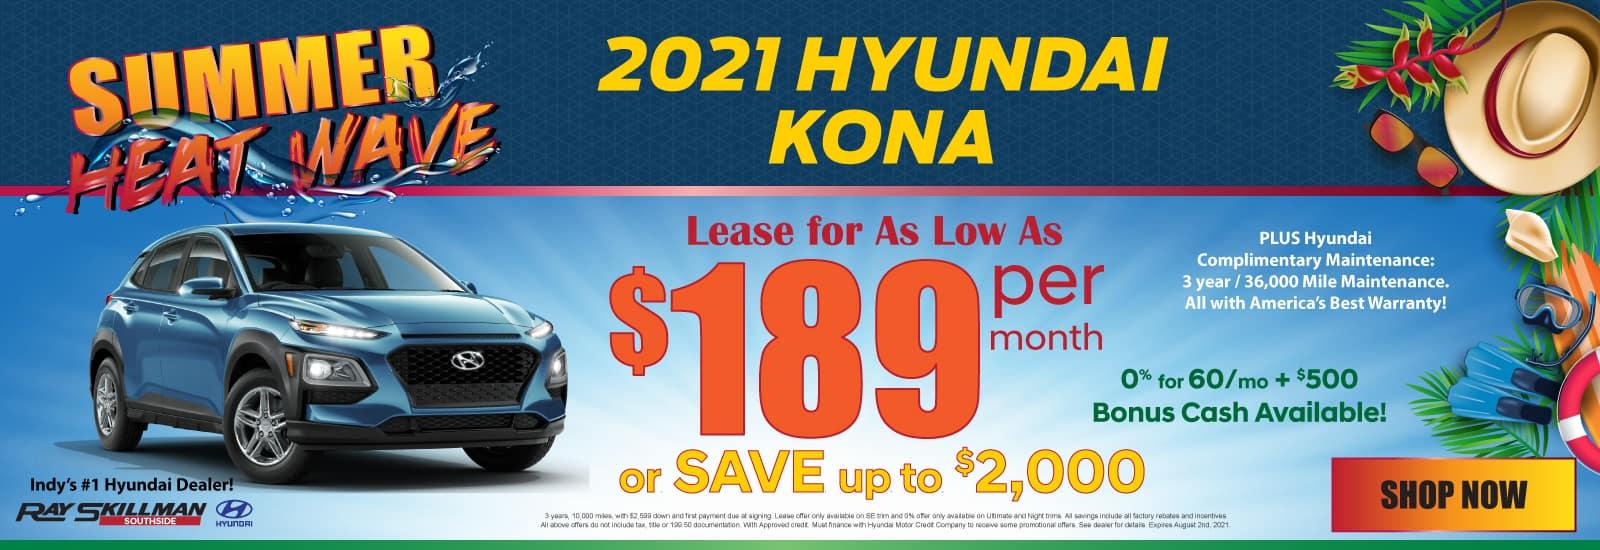 2021-Hyundai-Kona-Web-Banner-1600×550 (003)July